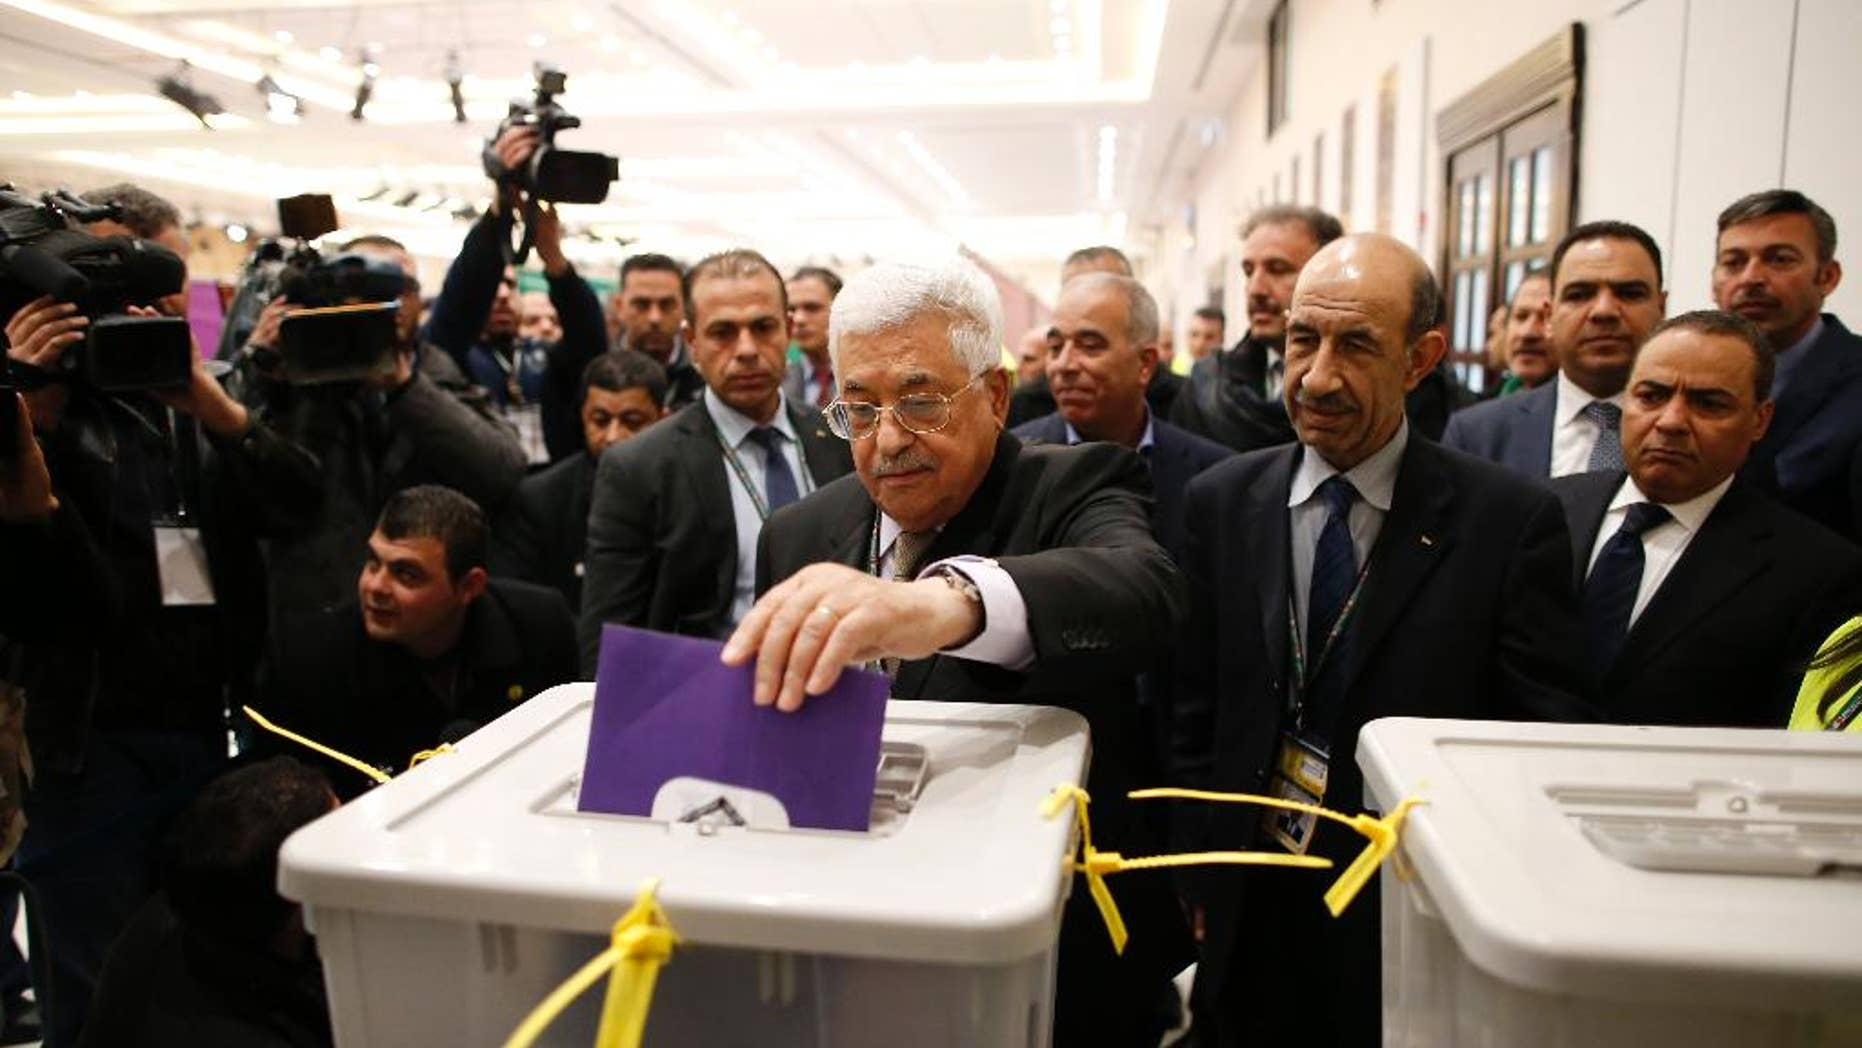 Palestinian president Mahmud Abbas casts his vote at the Muqataa, the Palestinian Authority headquarters, in the city of Ramallah, West Bank, Saturday Dec. 3, 2016. (Ahmad Gharabli/Pool photo via AP)